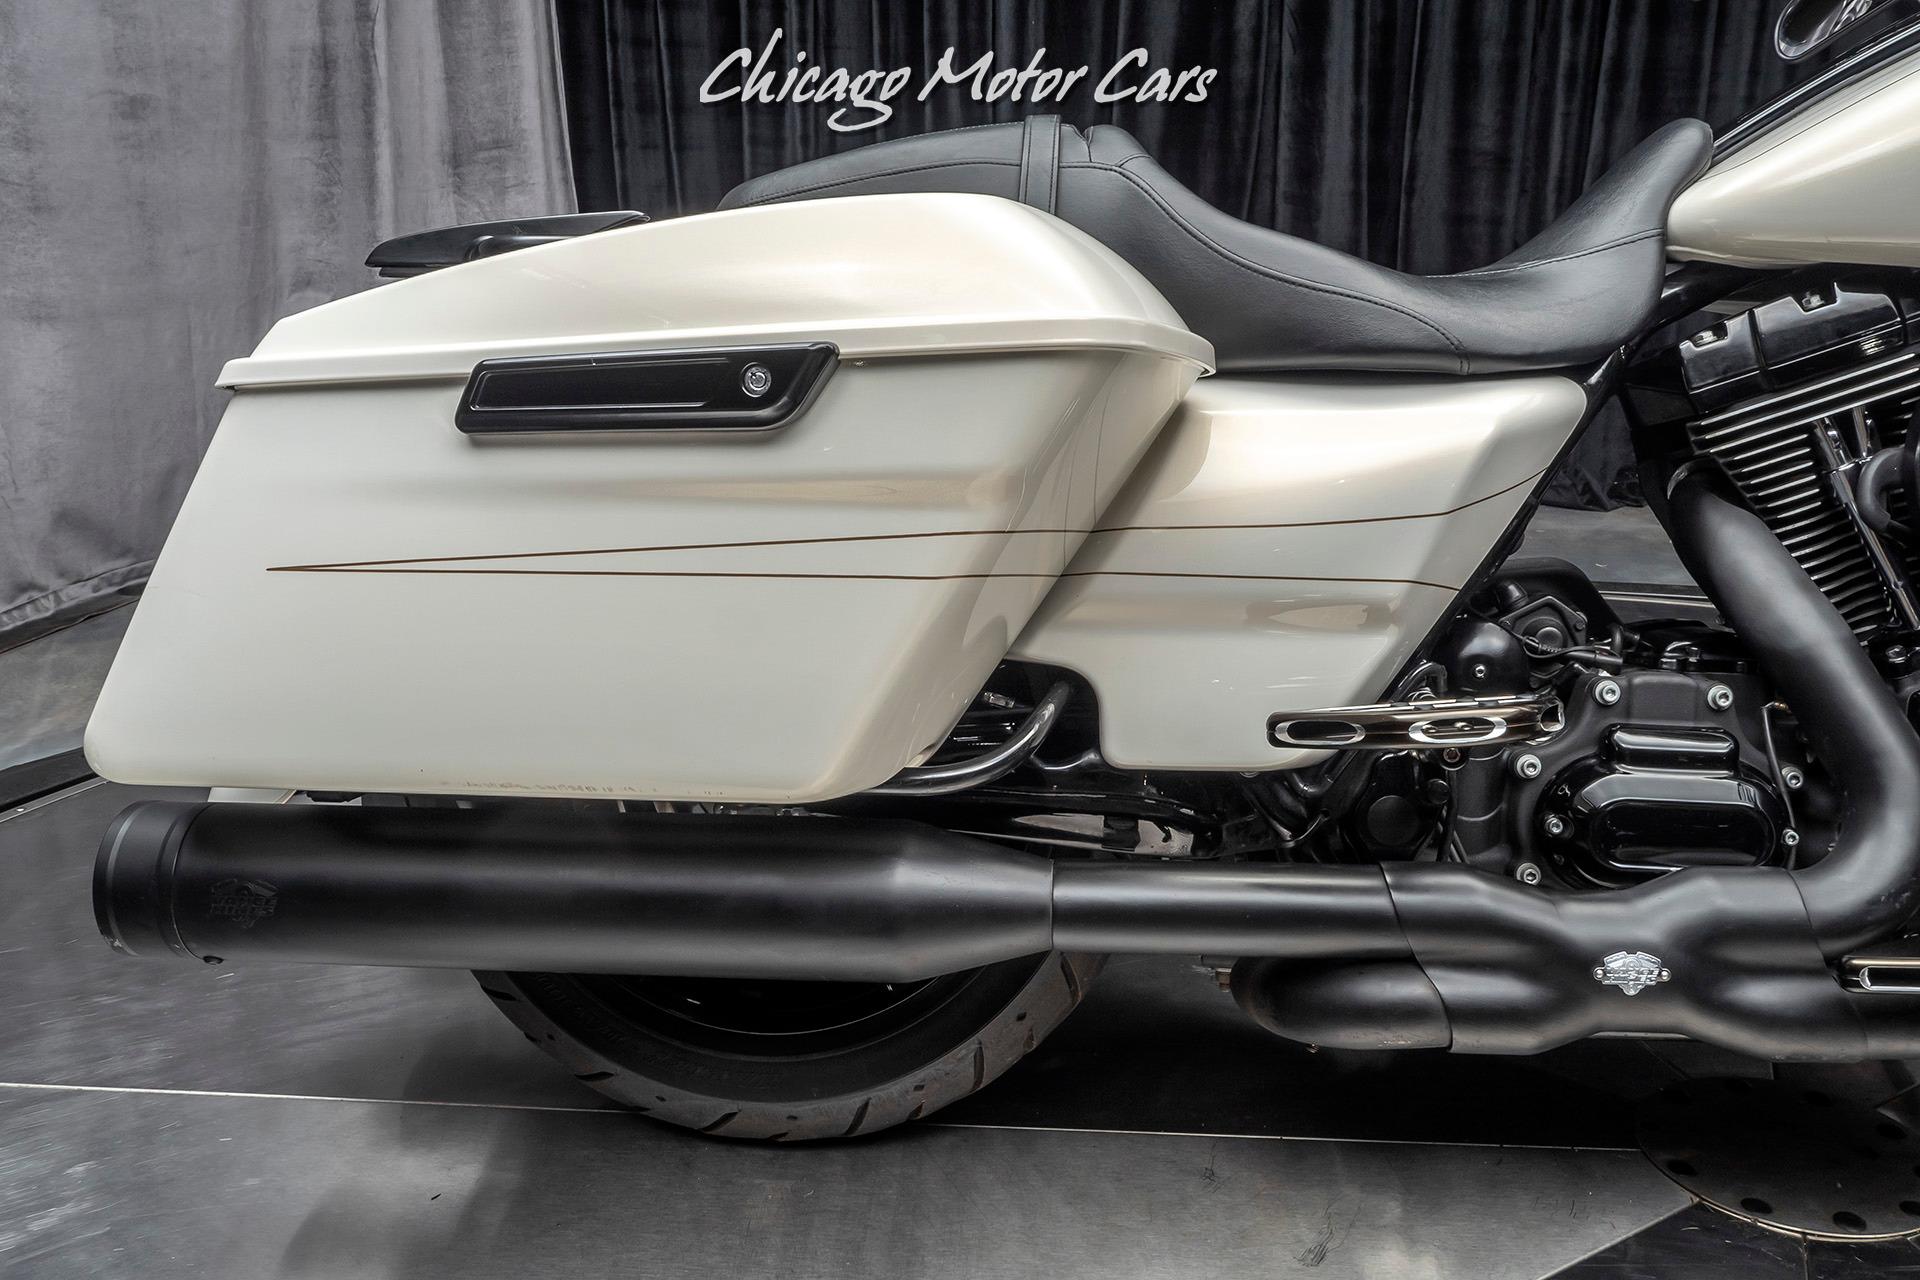 Used-2016-Harley-Davidson-Street-Glide